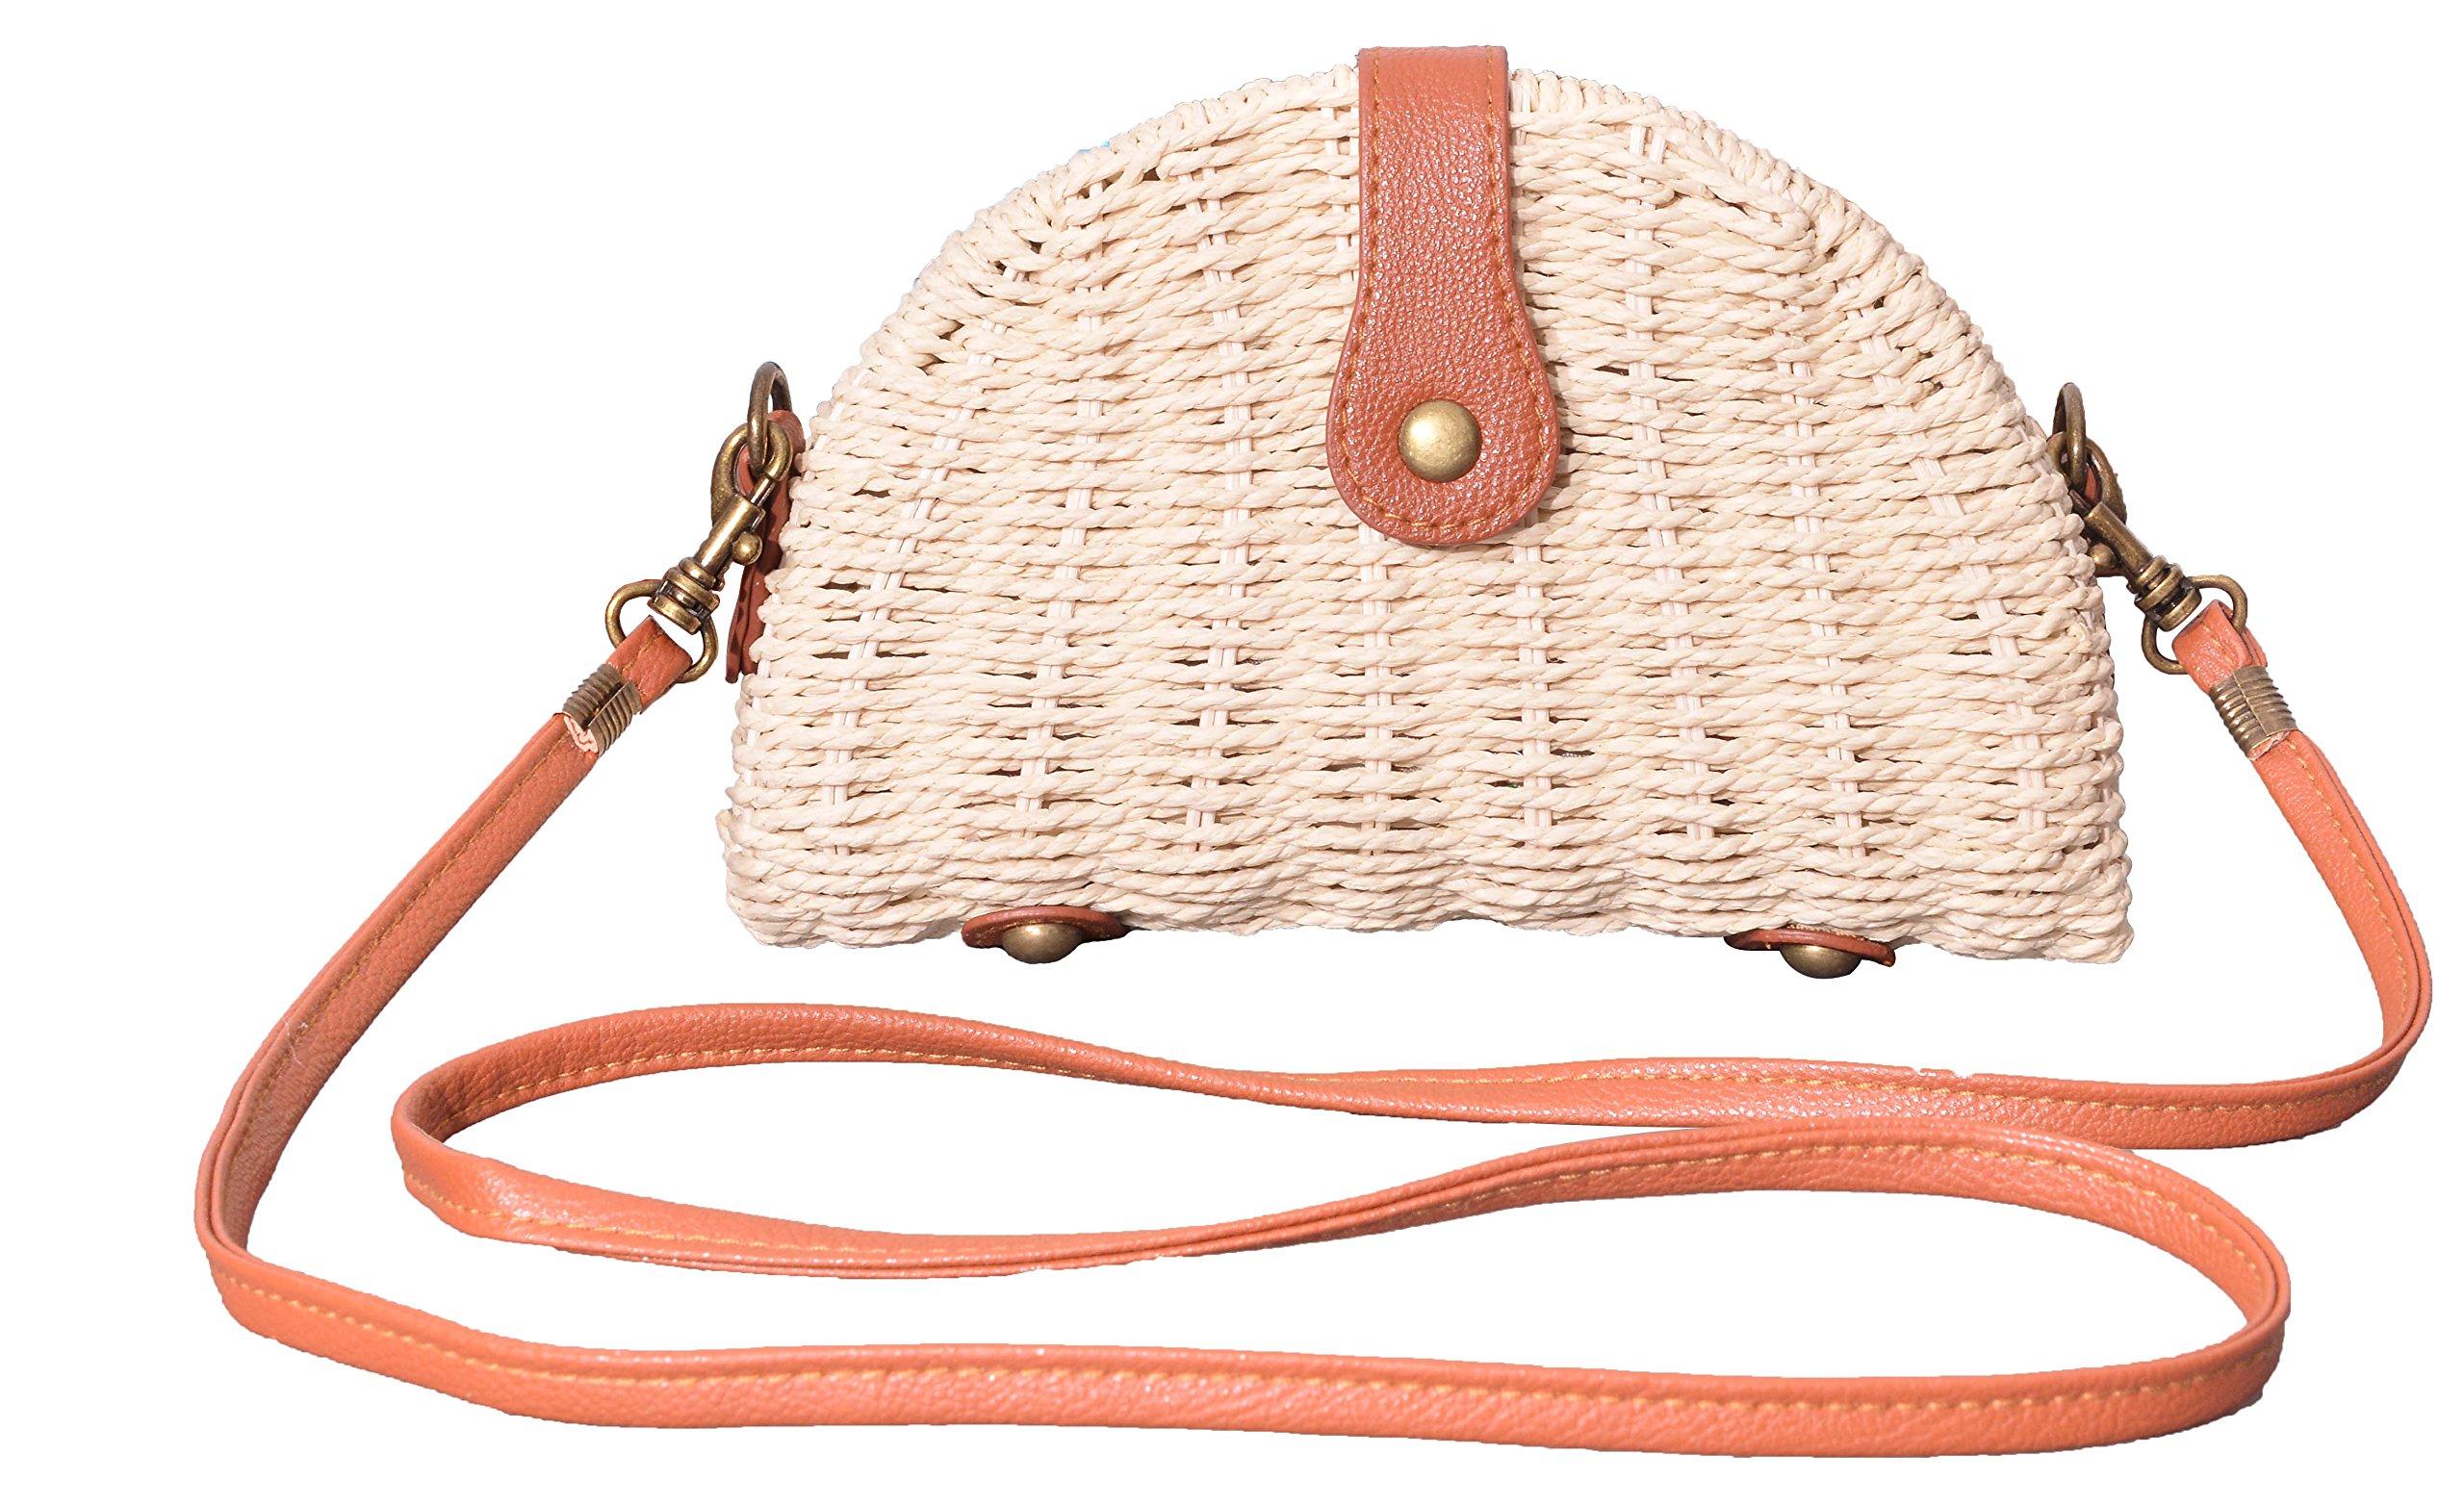 Outrip Straw Crossbody Bag Small Shoulder Bag Cell Phone Purse Vacation Handbag (Beige)